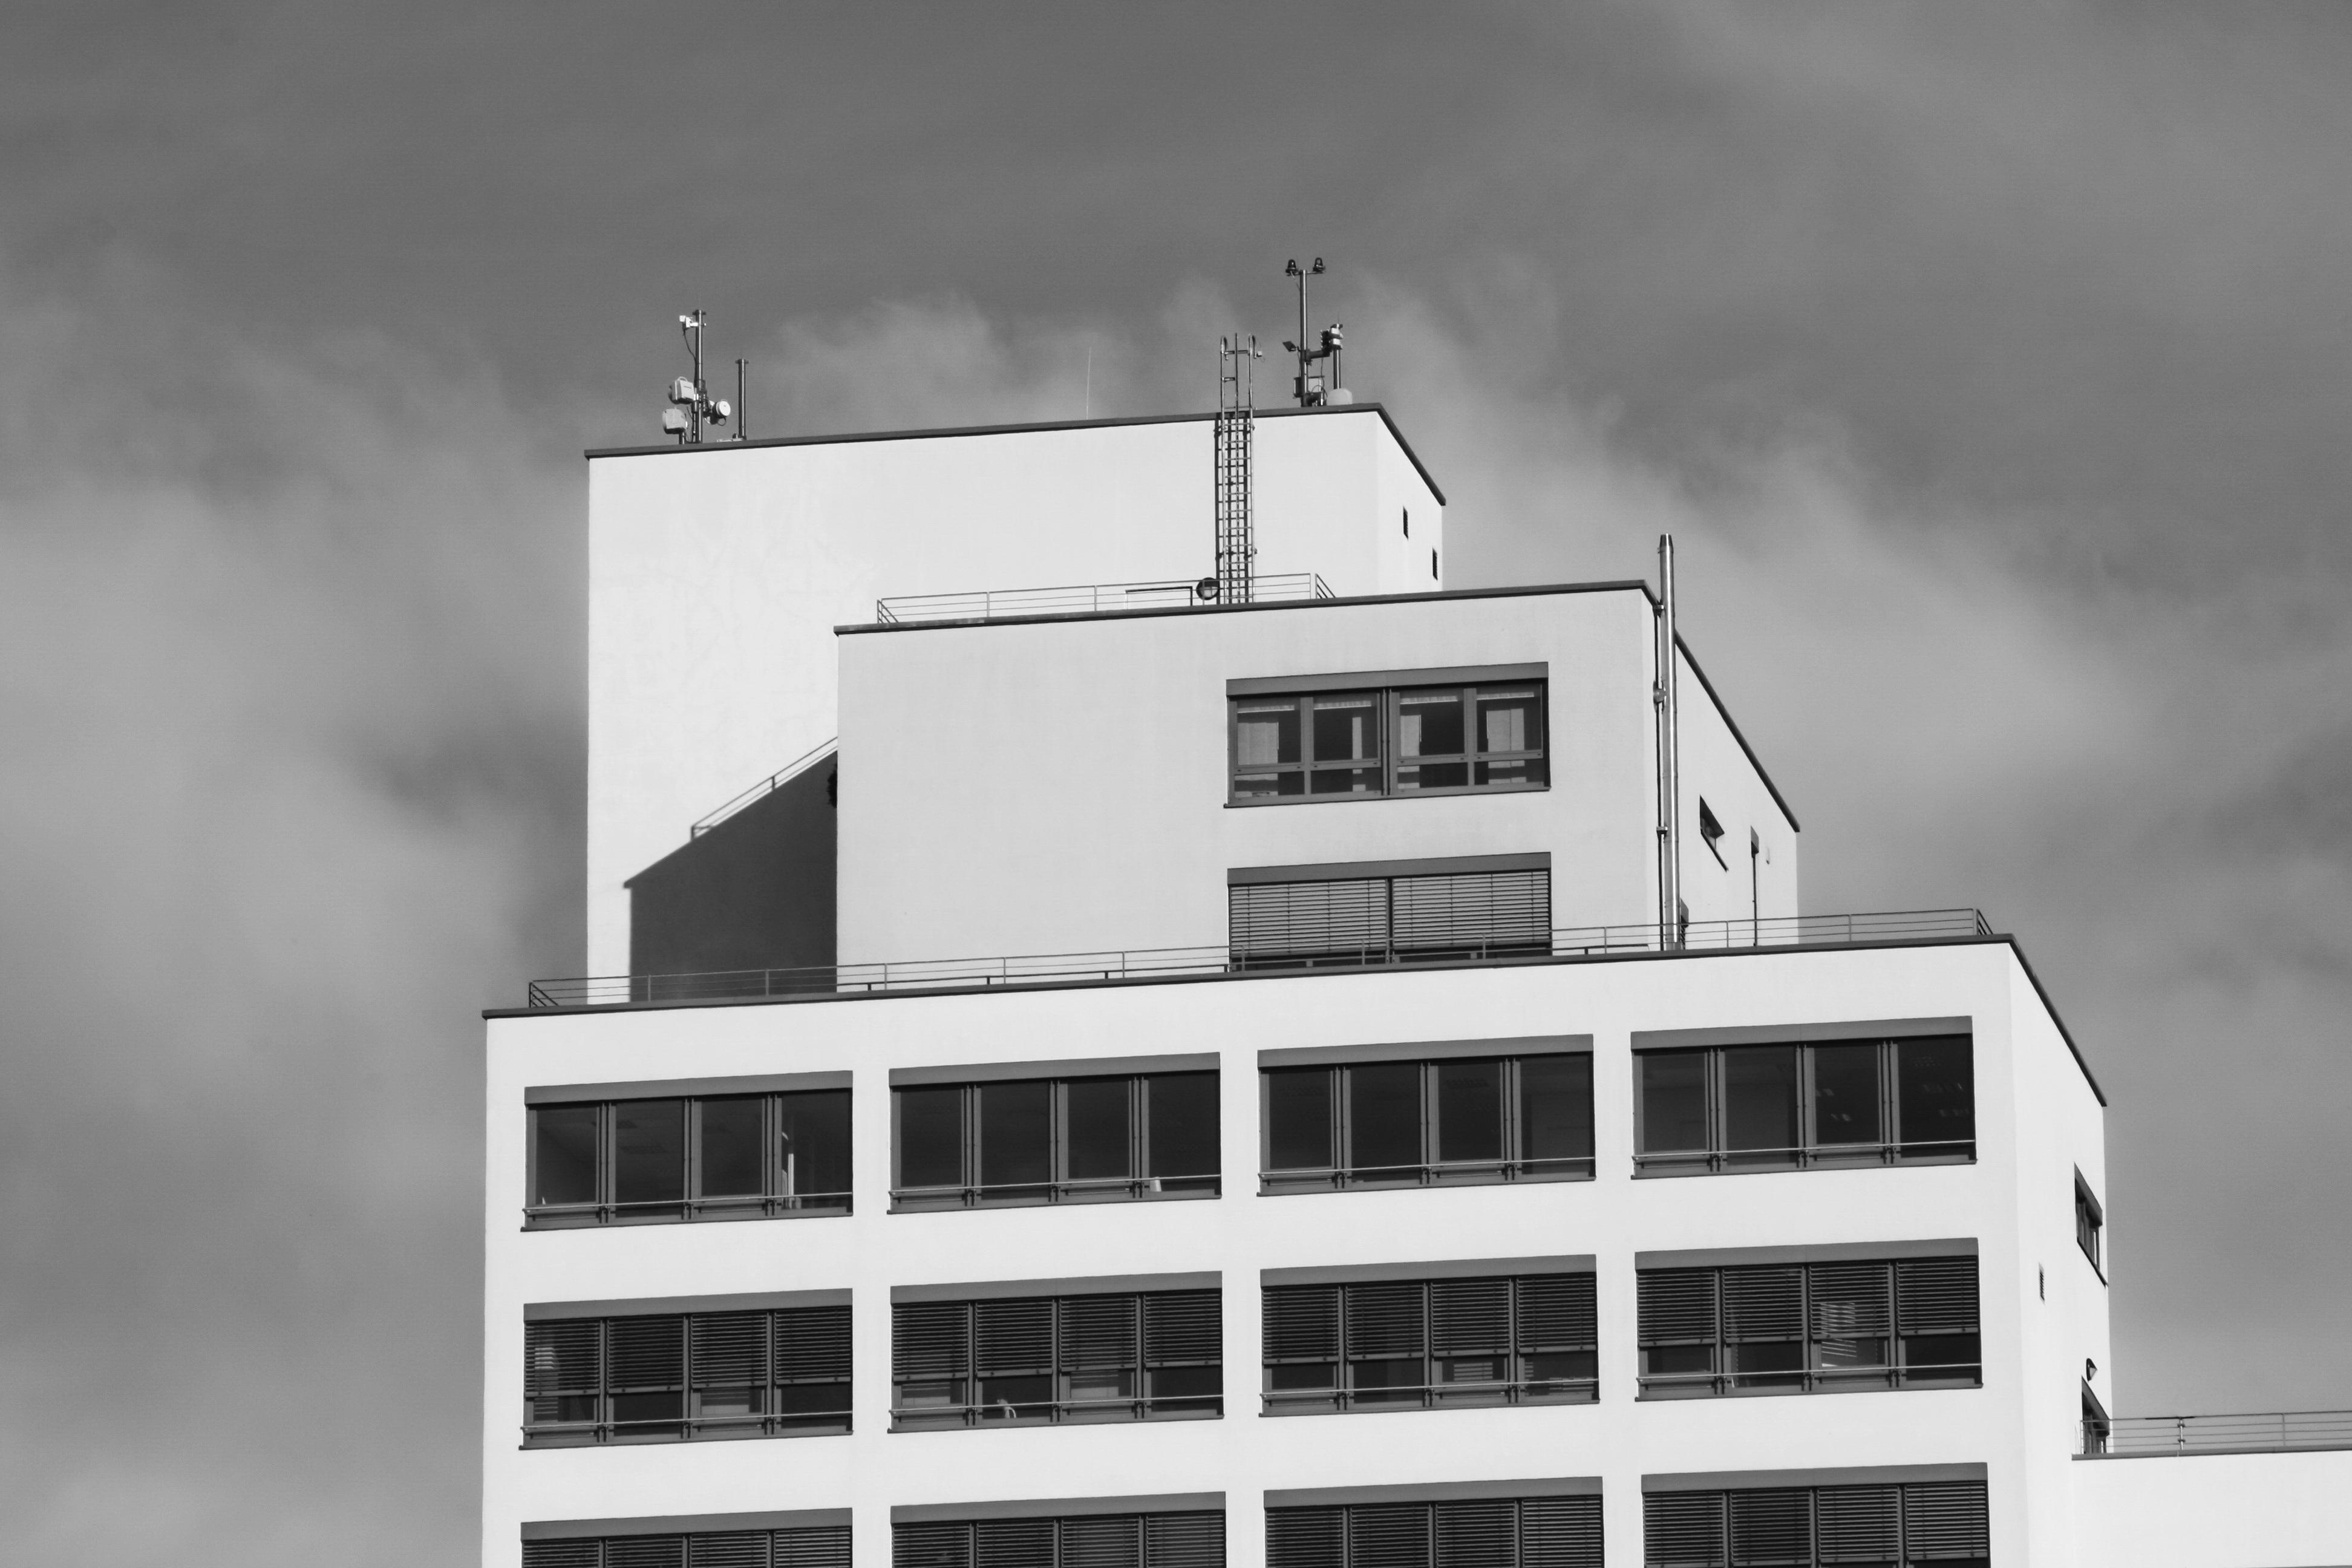 860 Gambar Hitam Putih Gedung HD